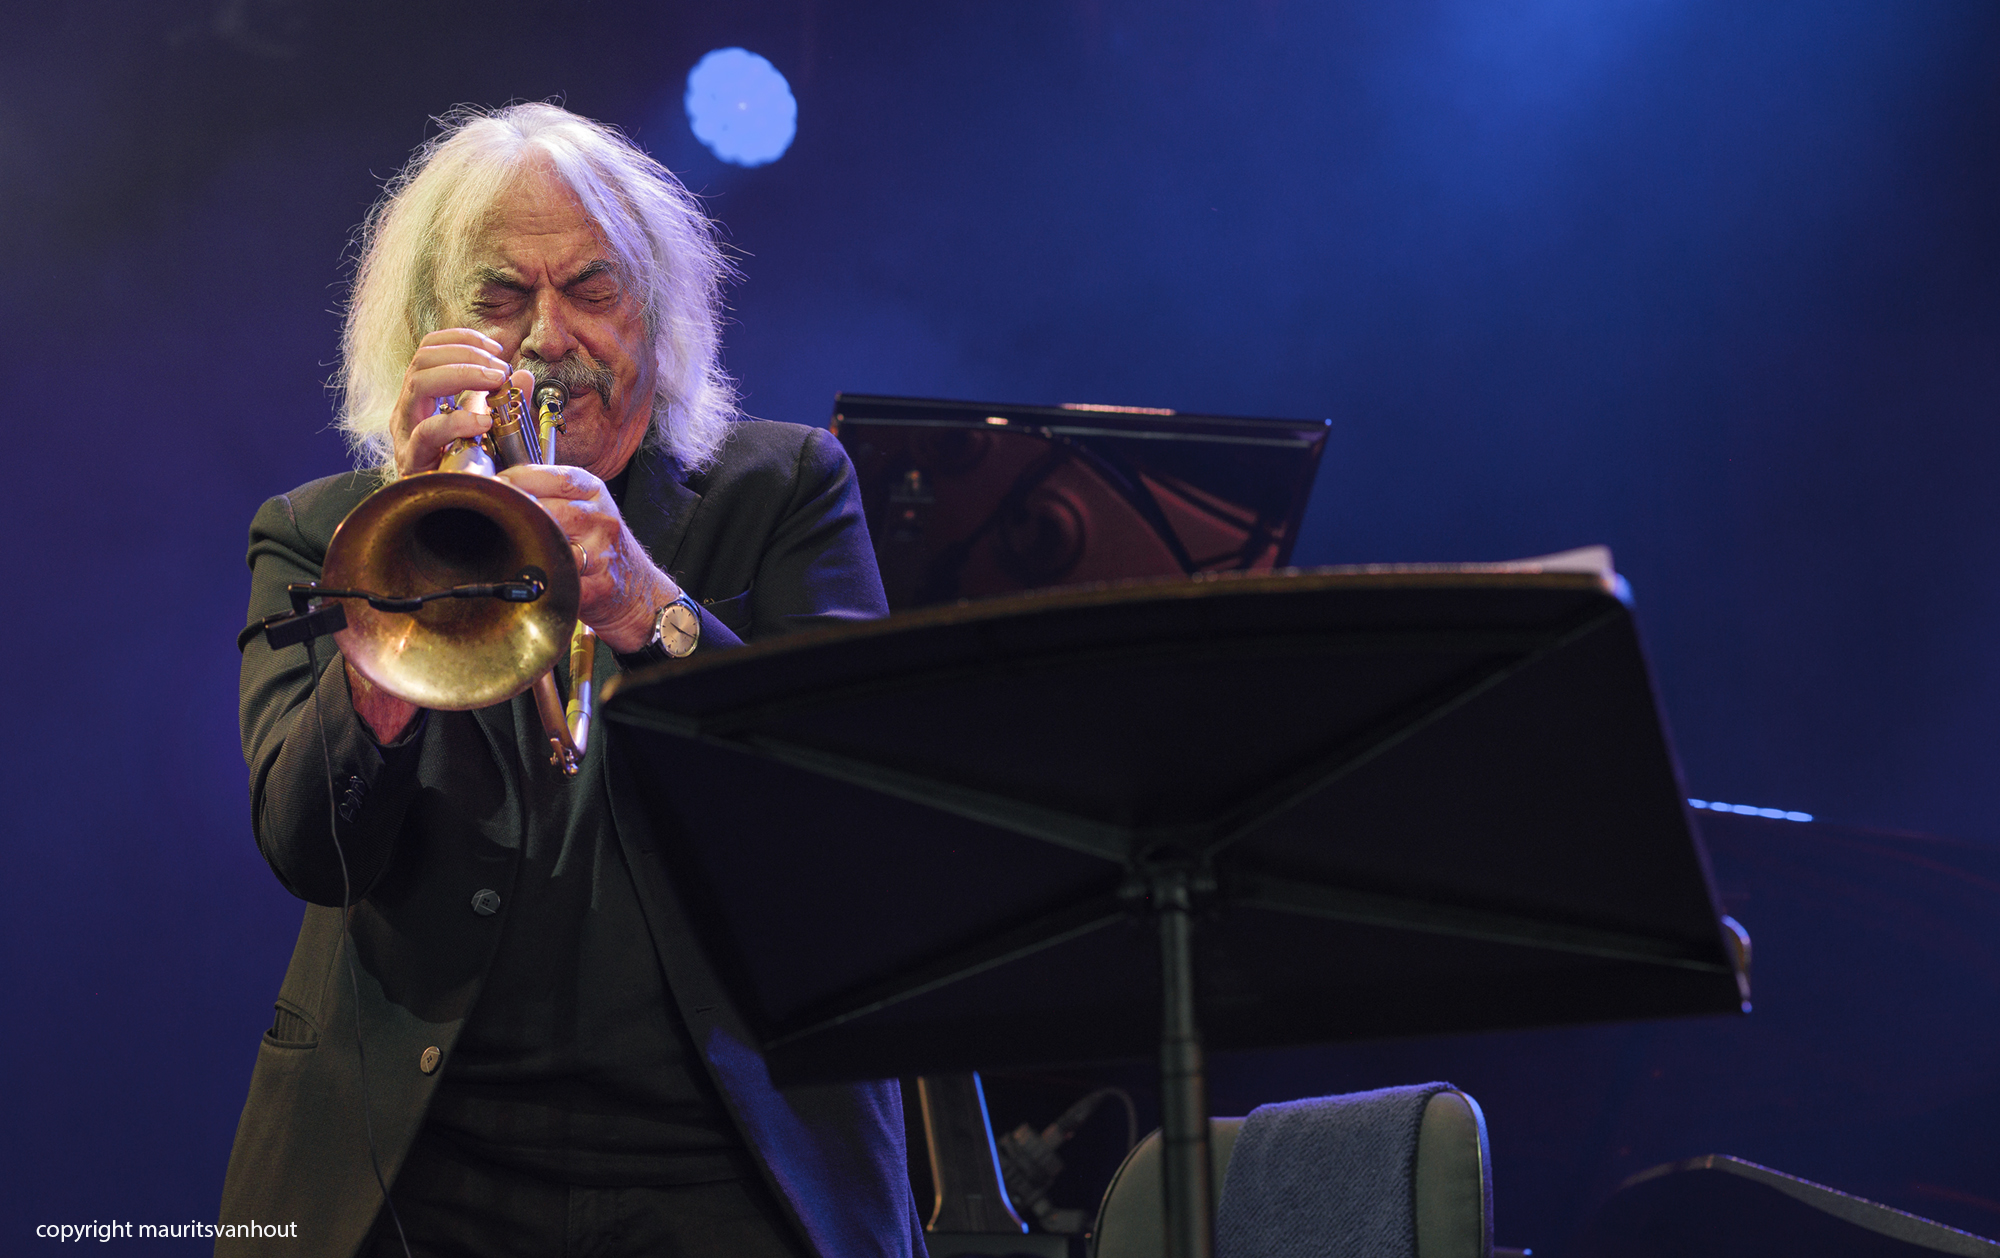 Enrico Rava live at Gent Jazz 2017